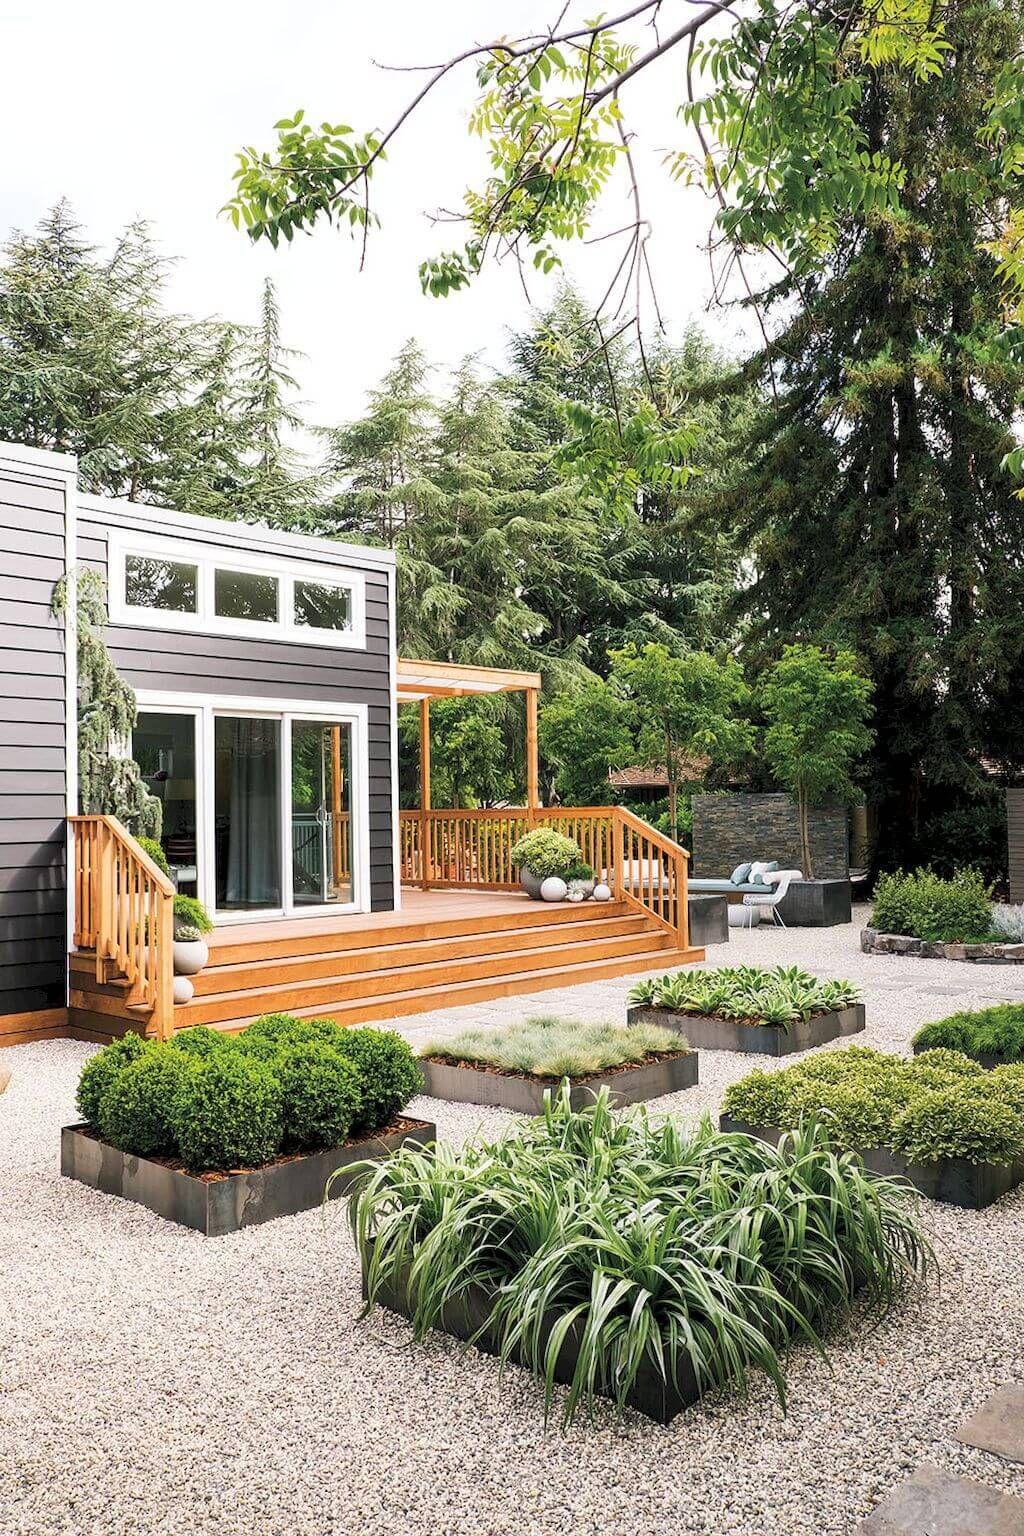 Pin By Tina Ramirez On Bloxburg Backyard In 2020 Inexpensive Backyard Ideas Backyard Cottage Modern Backyard Modern garden ideas bloxburg